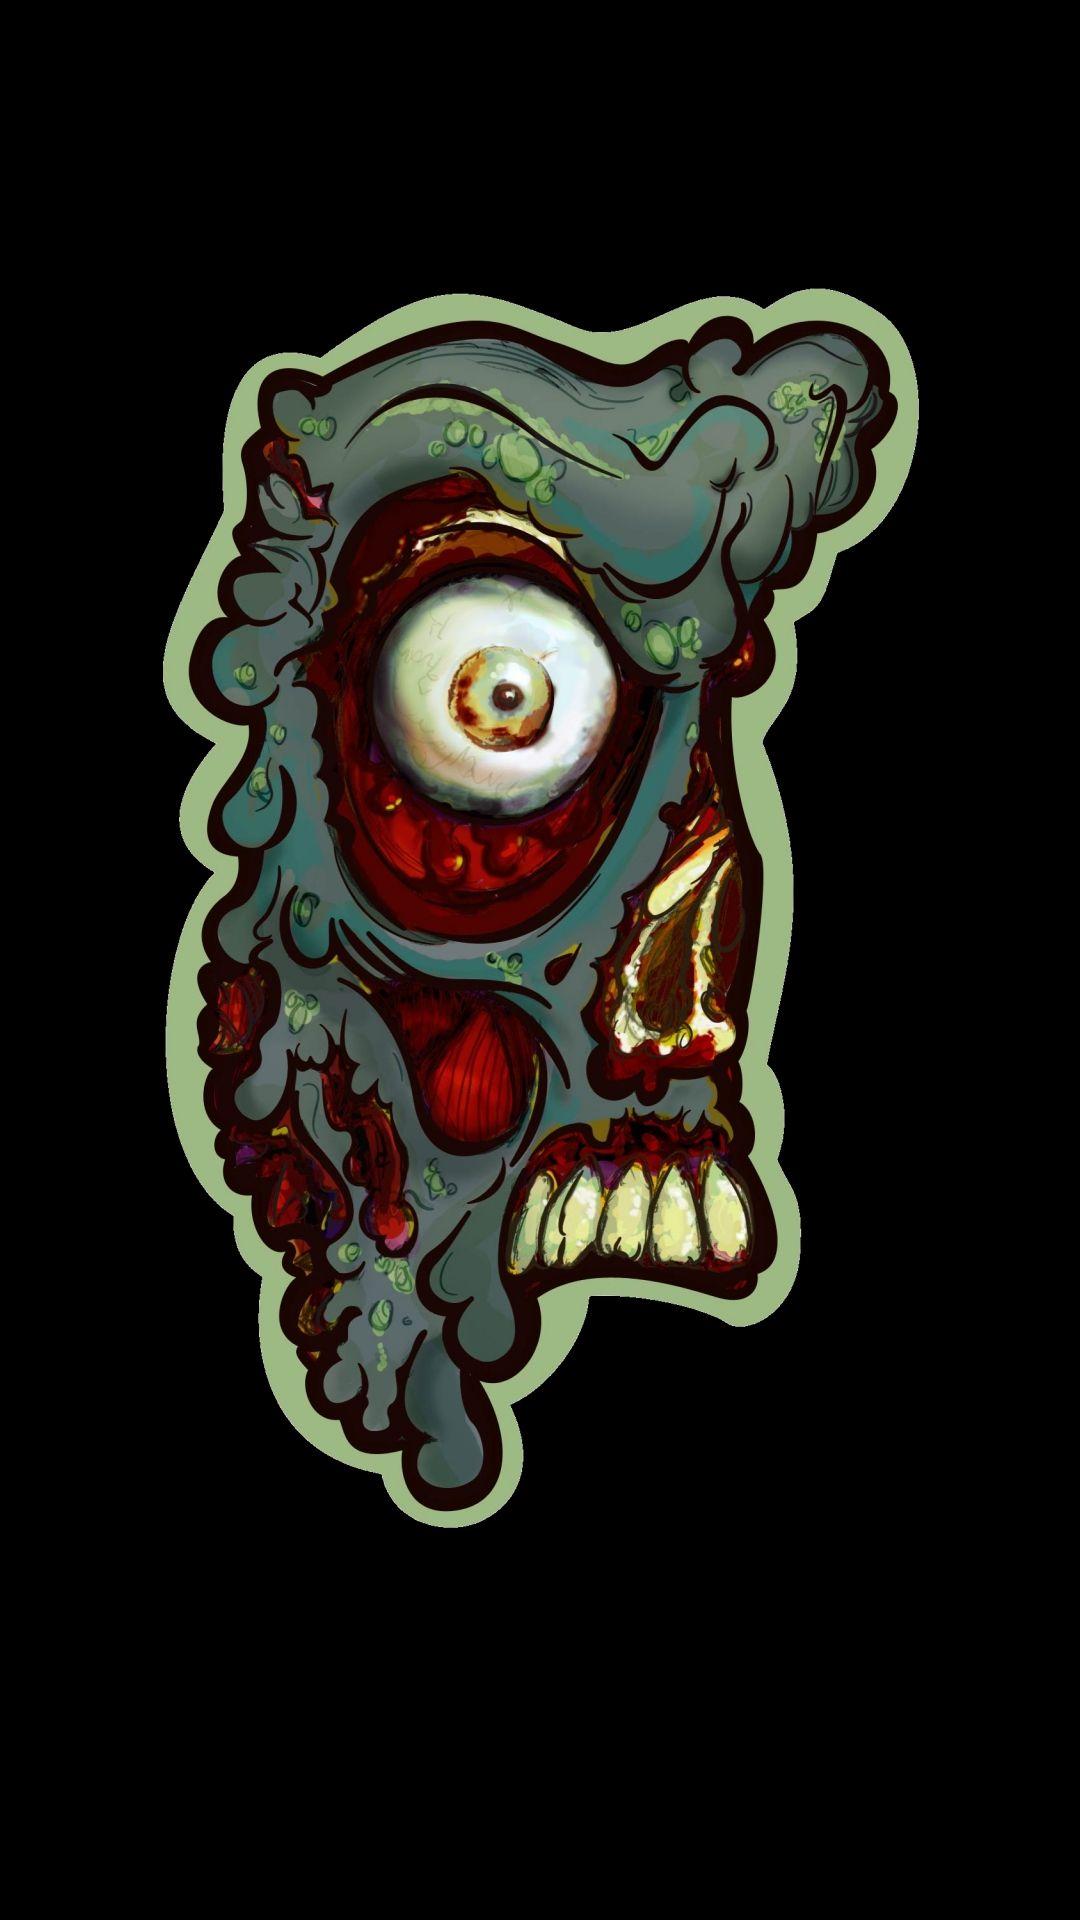 Zombie Galaxy wallpaper iPhone